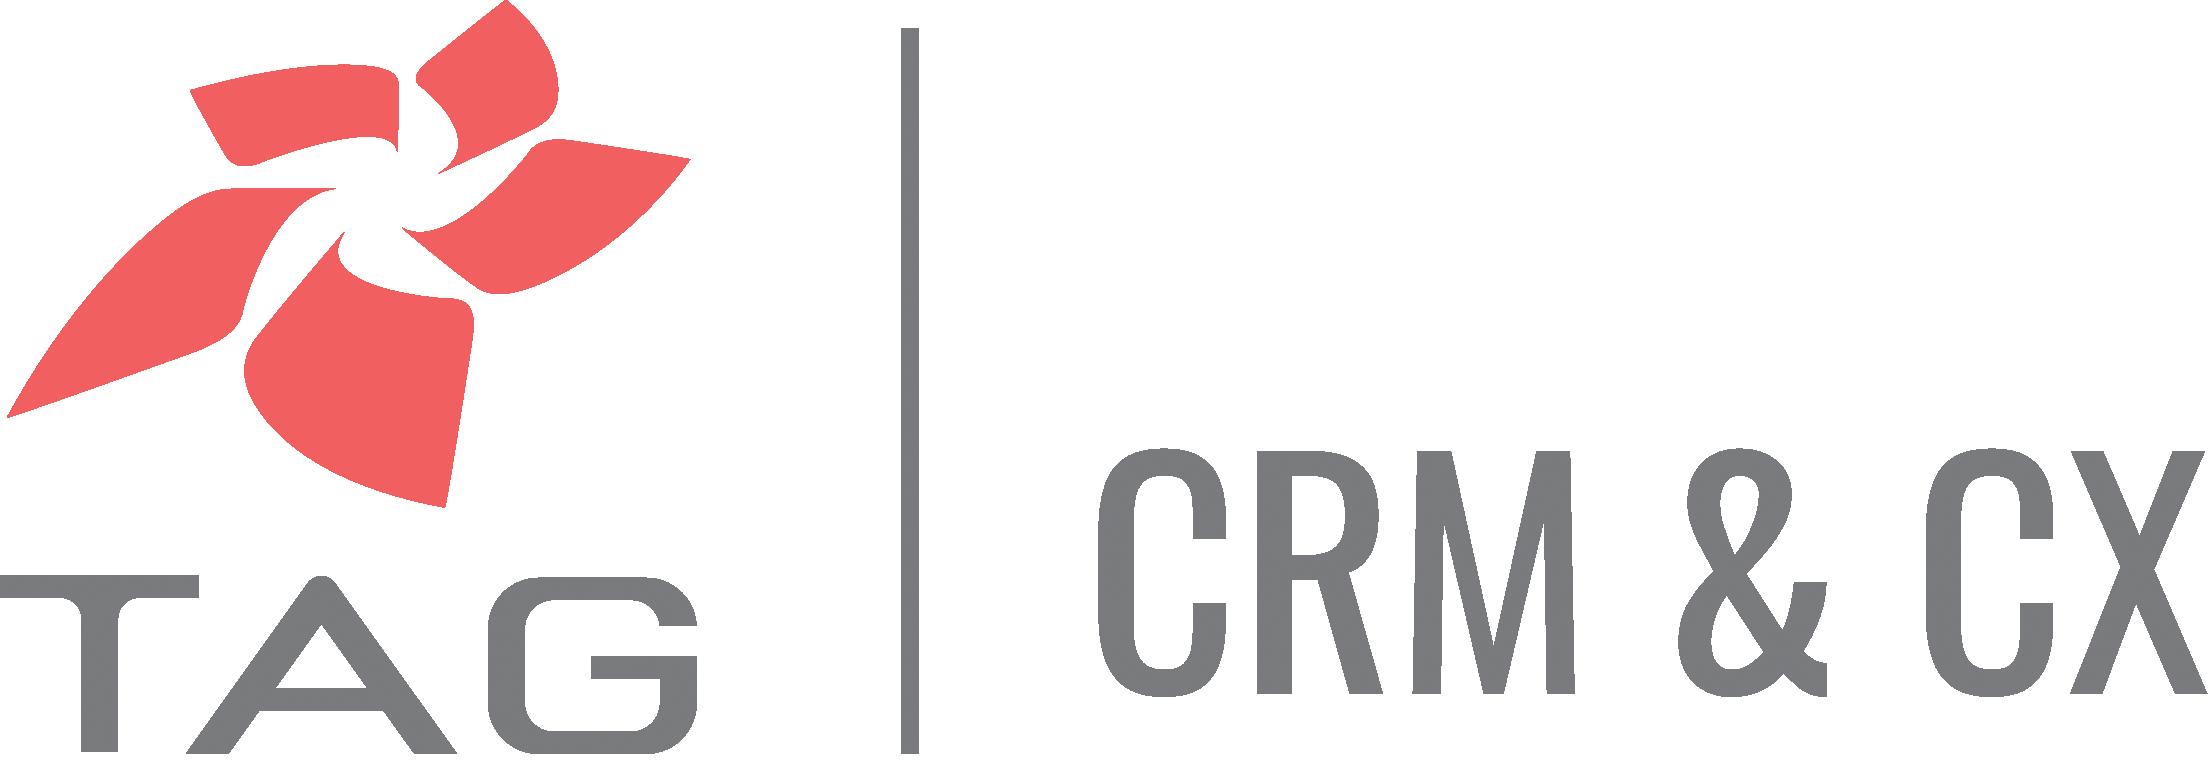 CRM & CX